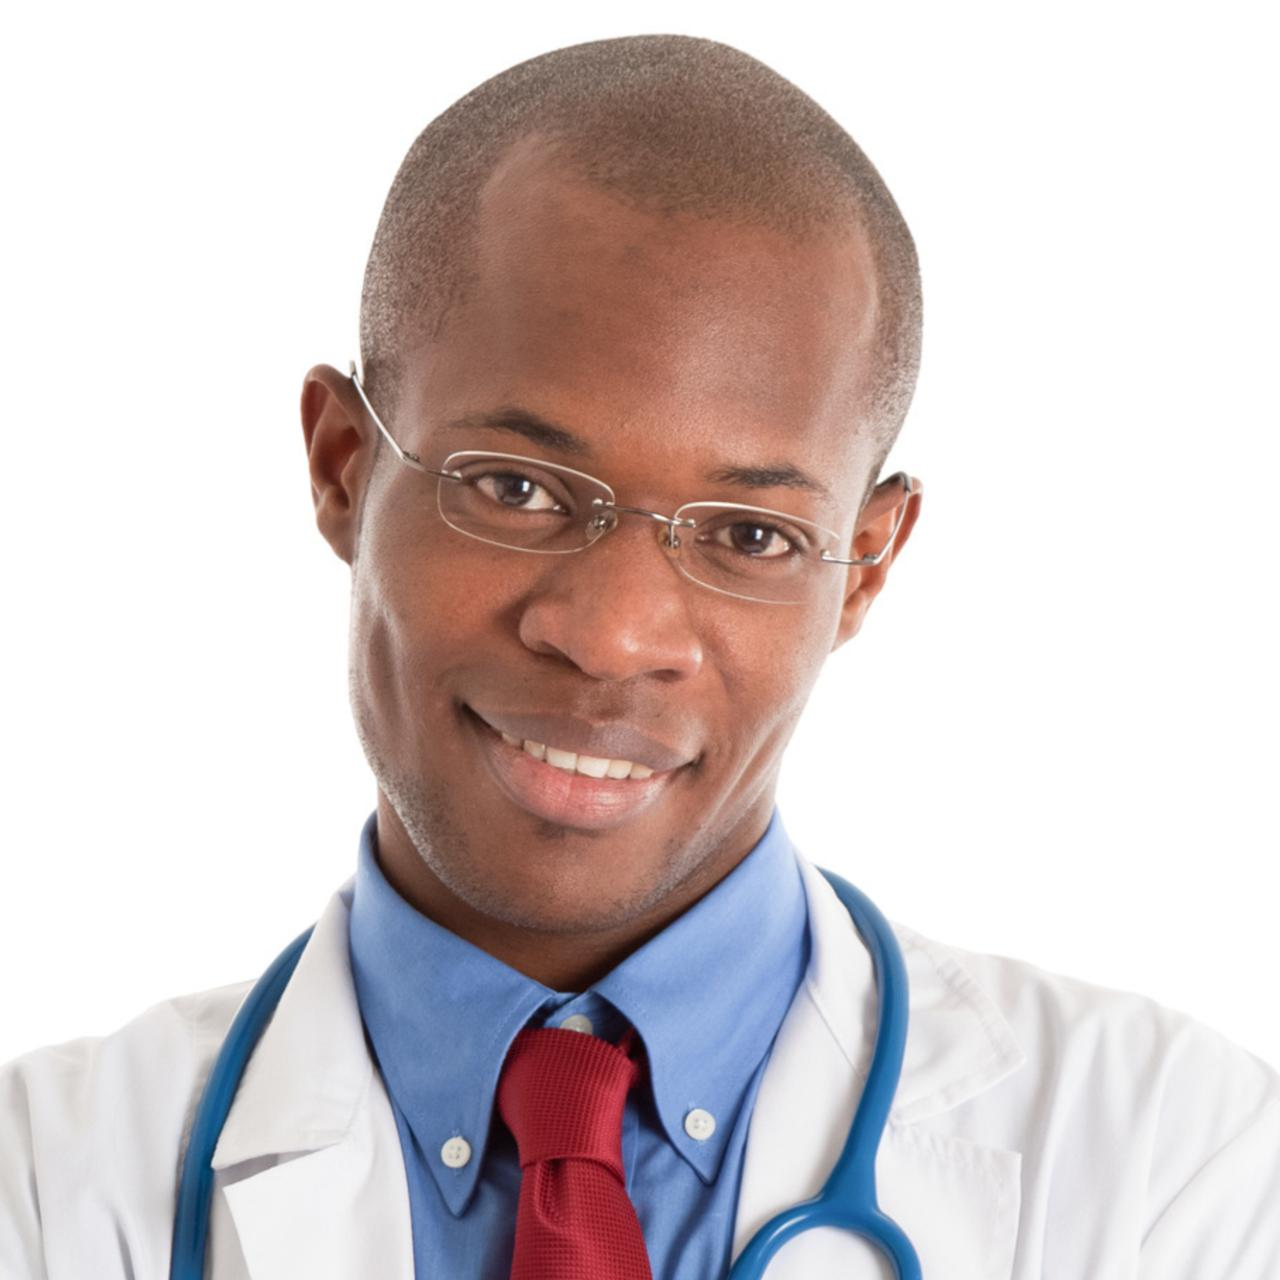 5c457168-9989-11e7-be2a-0242ac110002-Medical_7.jpg